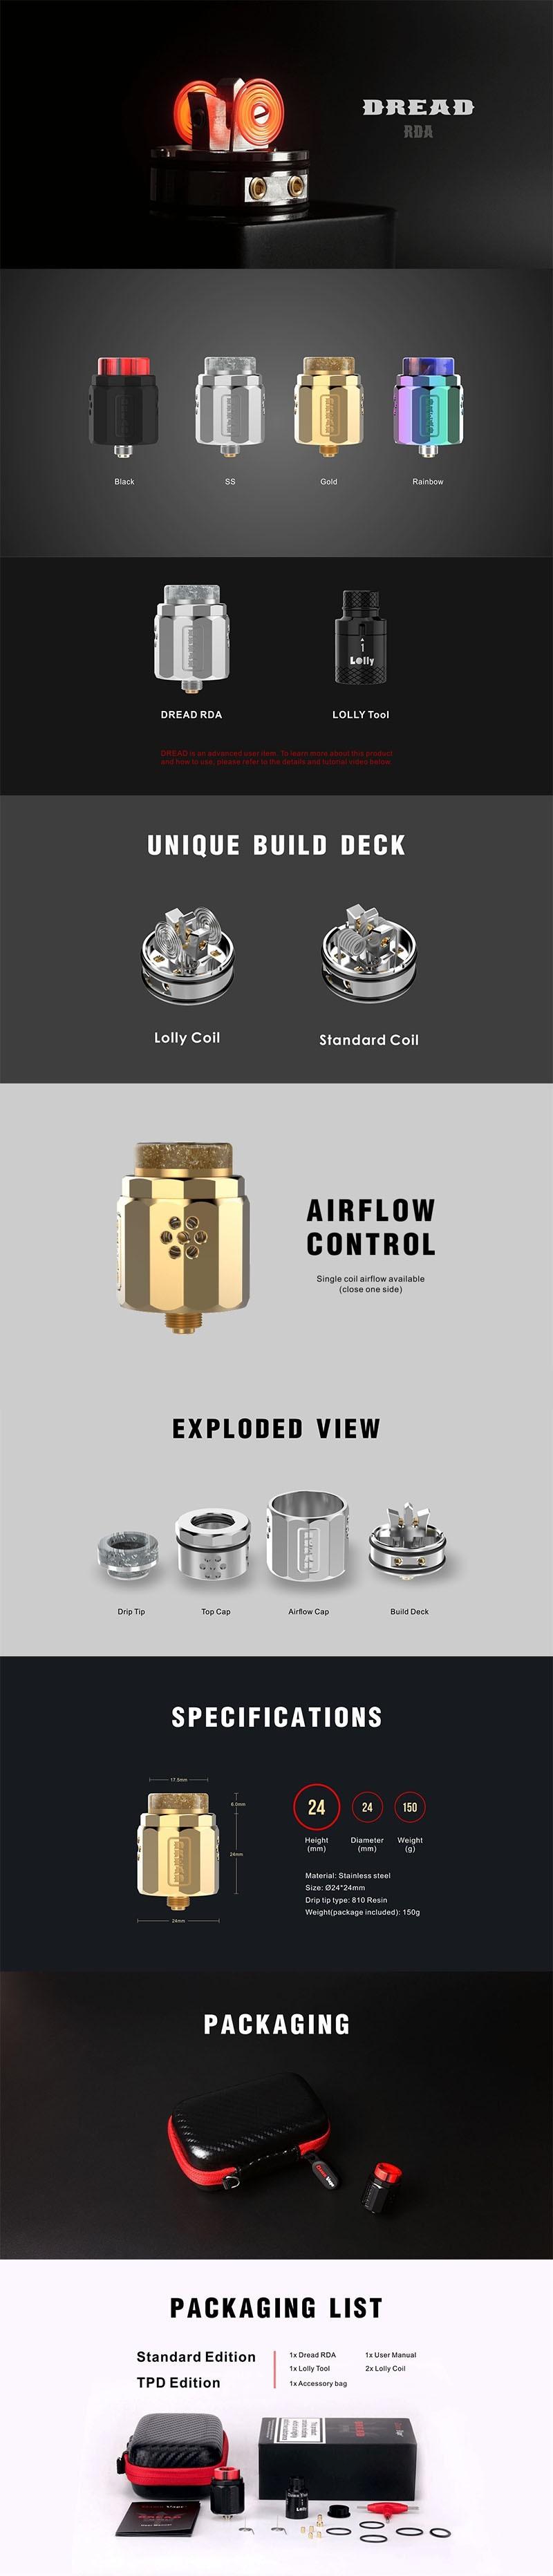 Damn Vape Dread RDA Rebuildable Dripping Atomizer w/ BF Pin